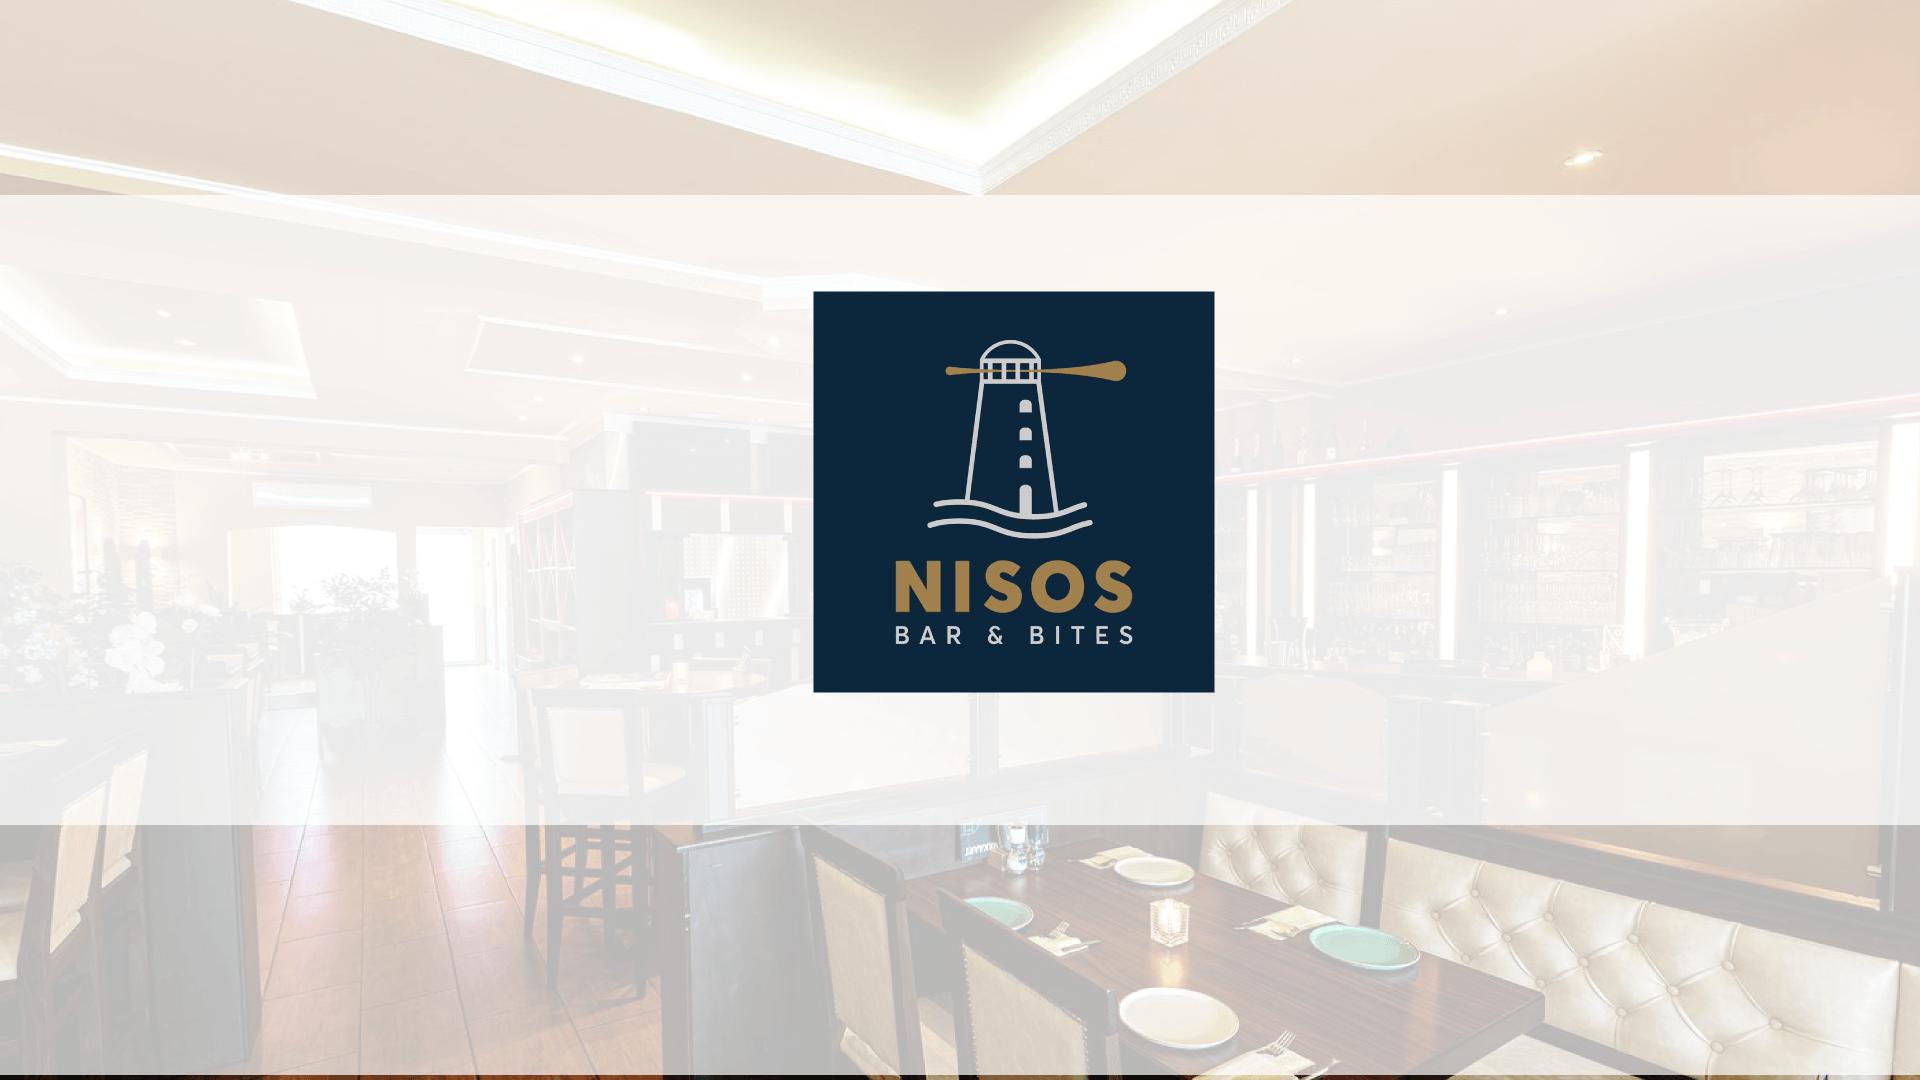 Nisos Bar & Bites